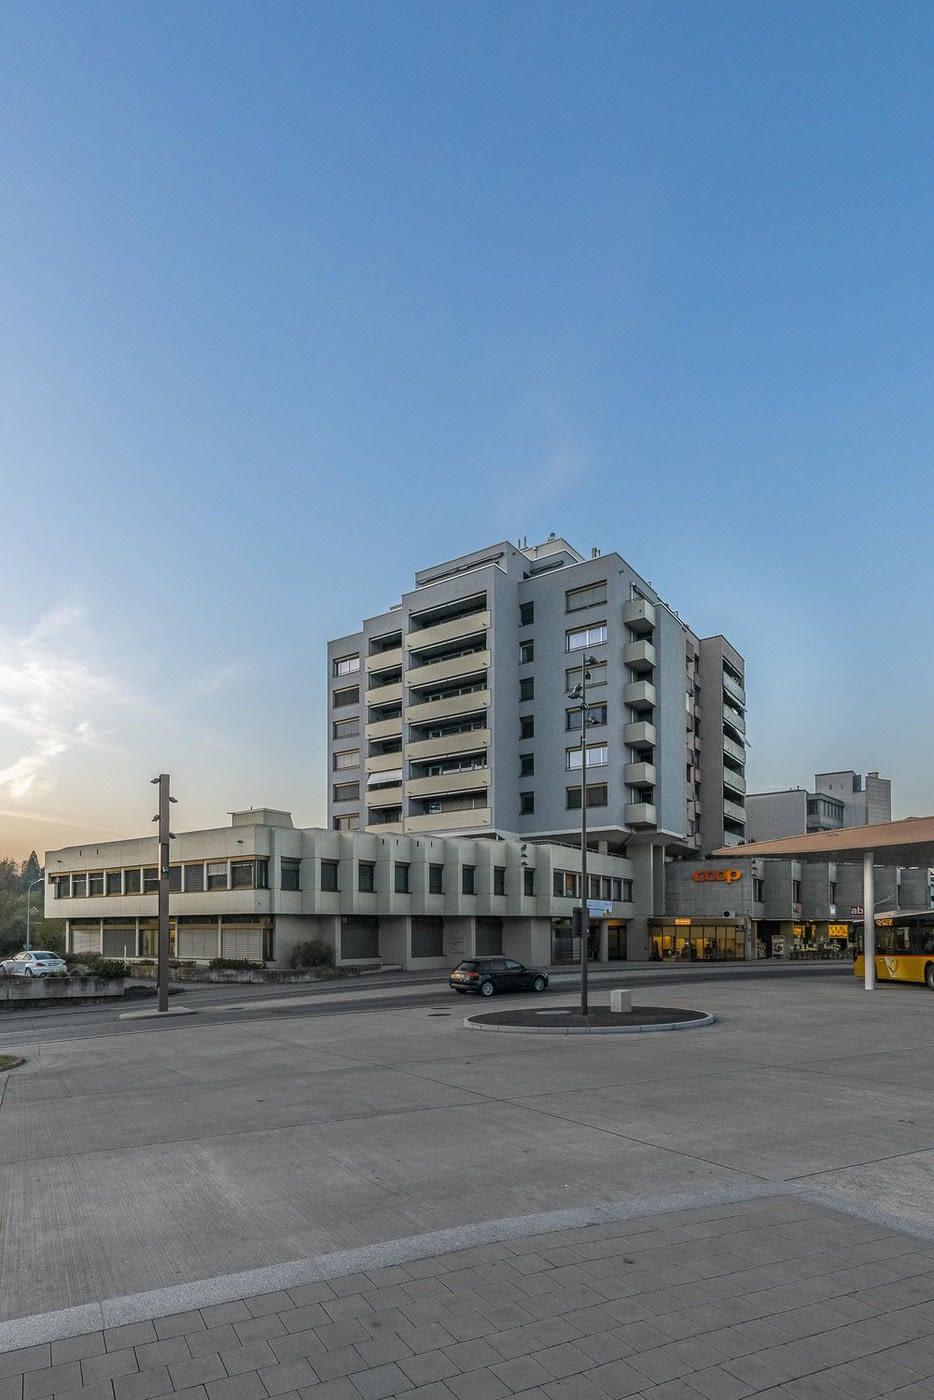 Bahnhofstrasse 30